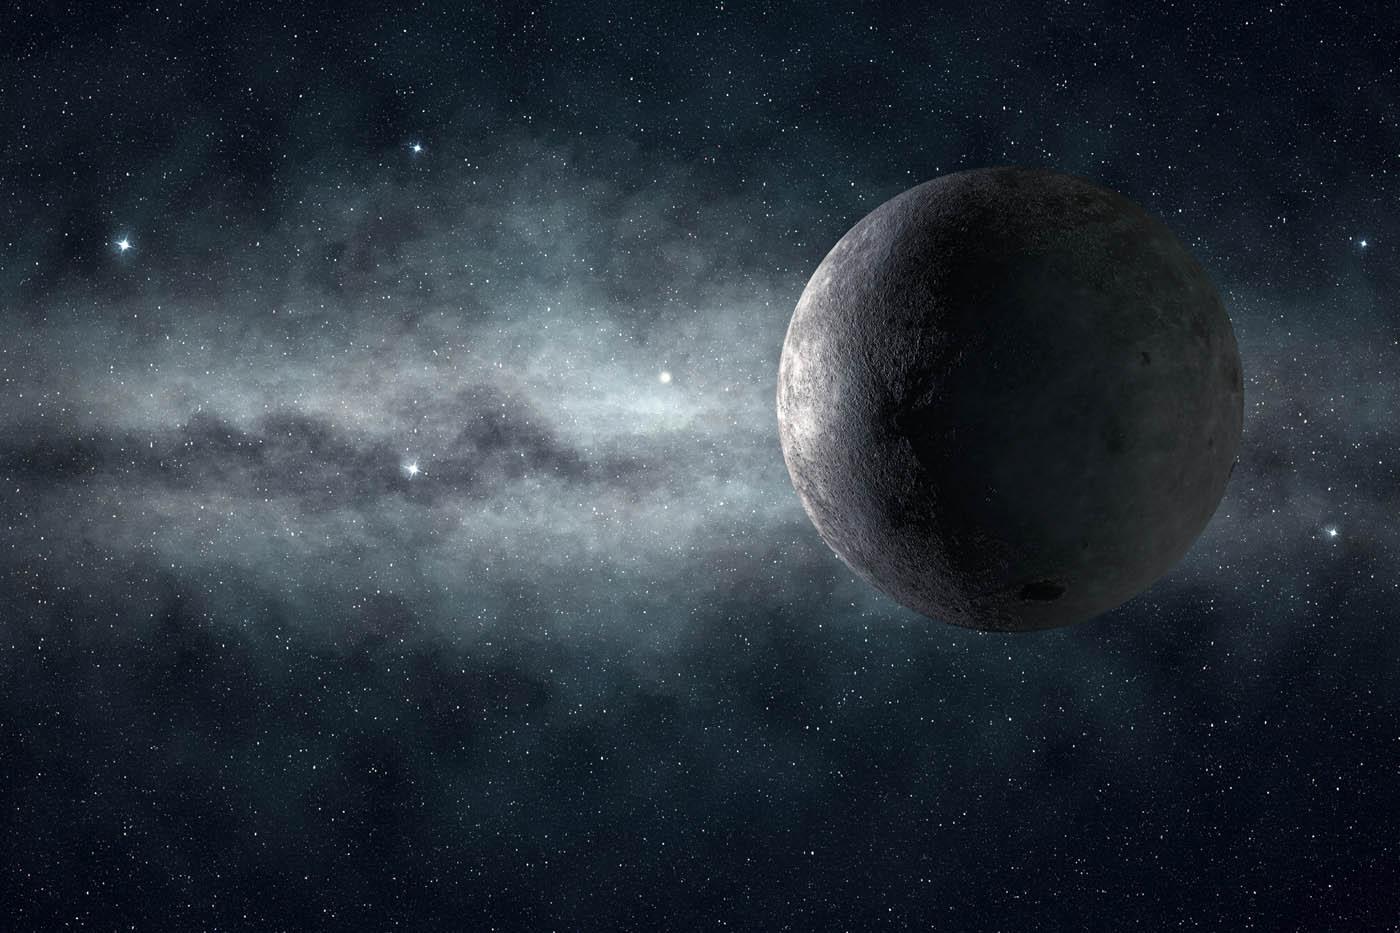 Mondlandung - 50 Jahre Jubiläum TV-Programm